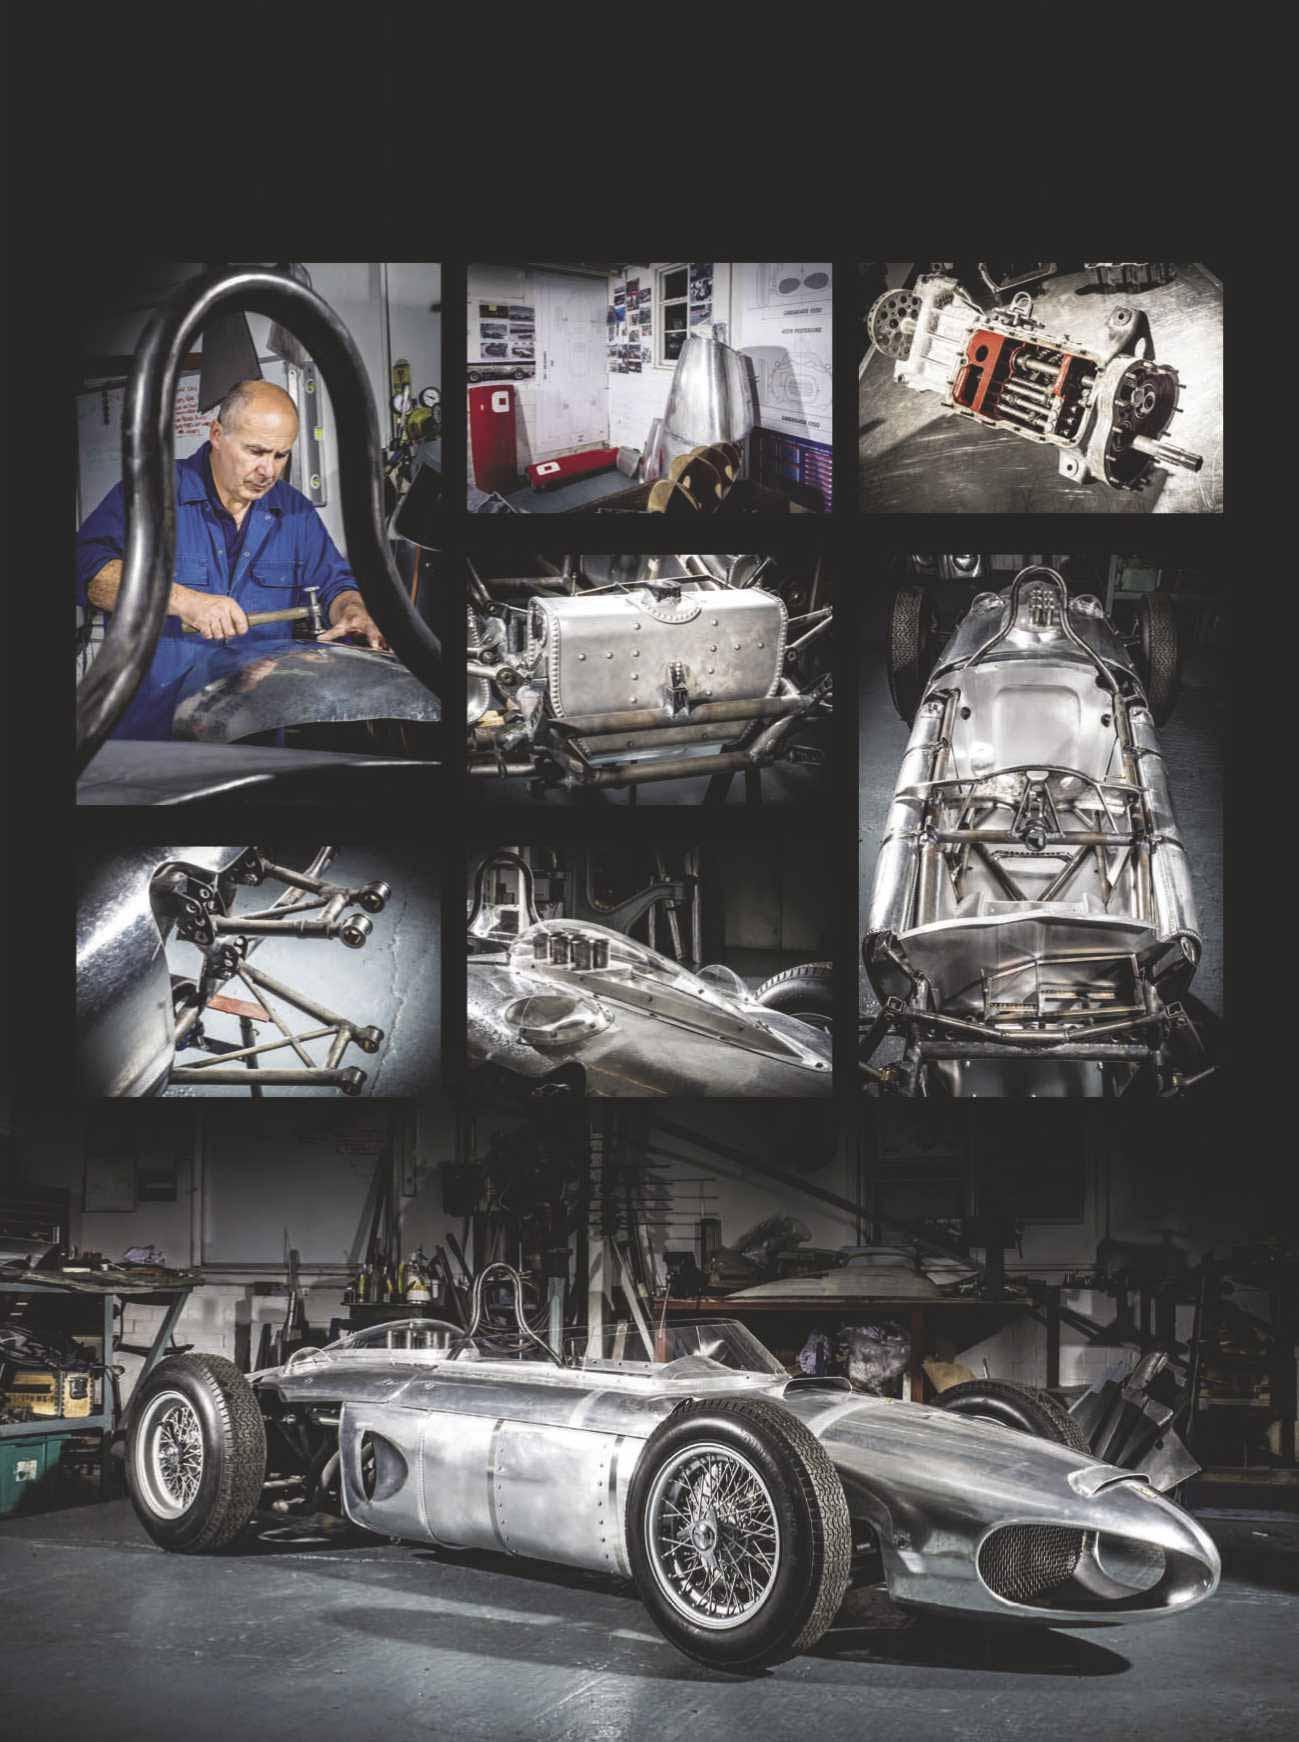 1961 Ferrari Tipo 156 restoration